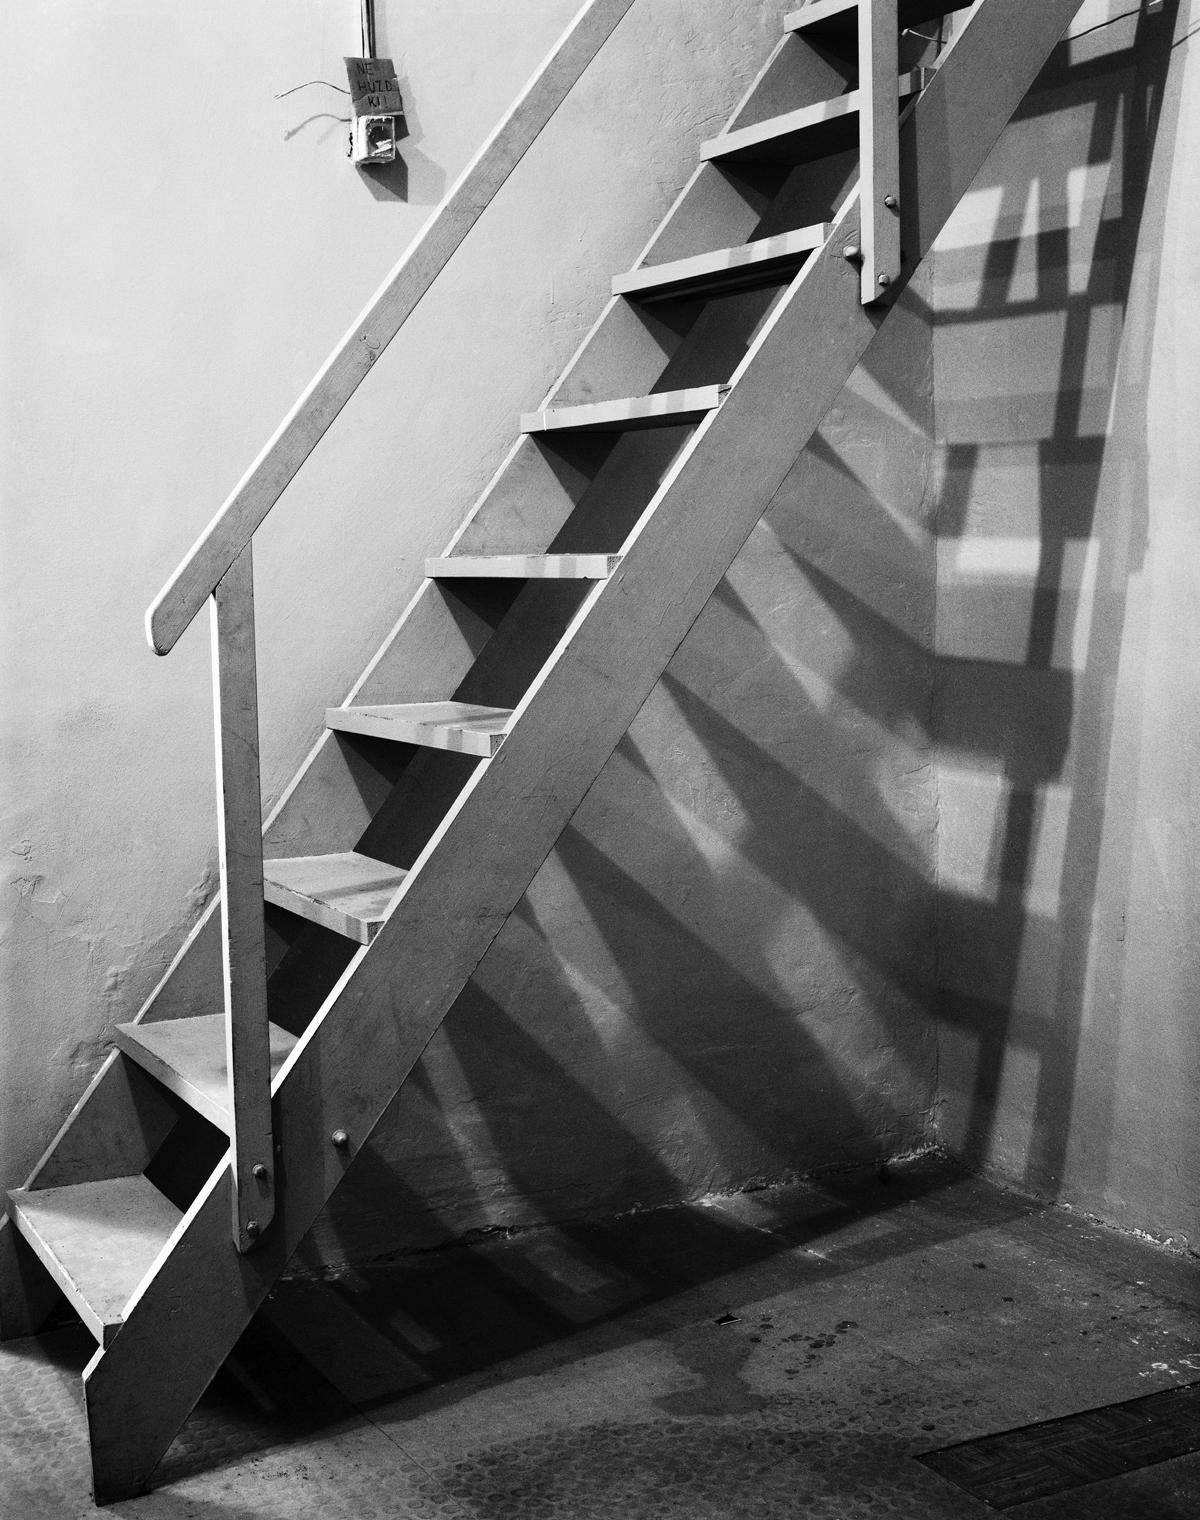 Stairs 2011, Epson fine art print, 50 x 40 cm Ed. of 5